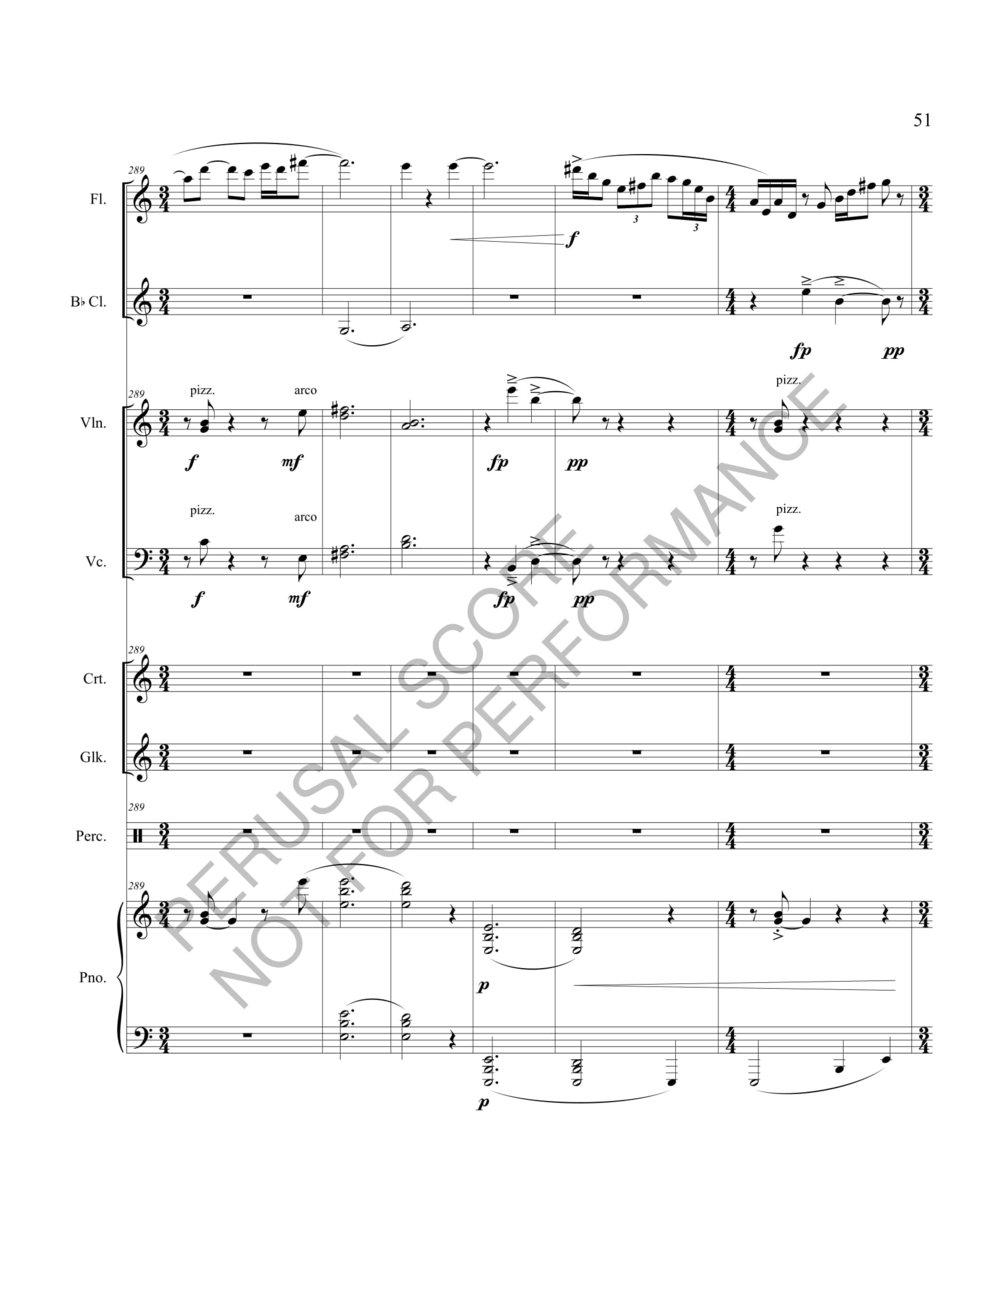 Boyd Terra Liberi Score-watermark-57.jpg